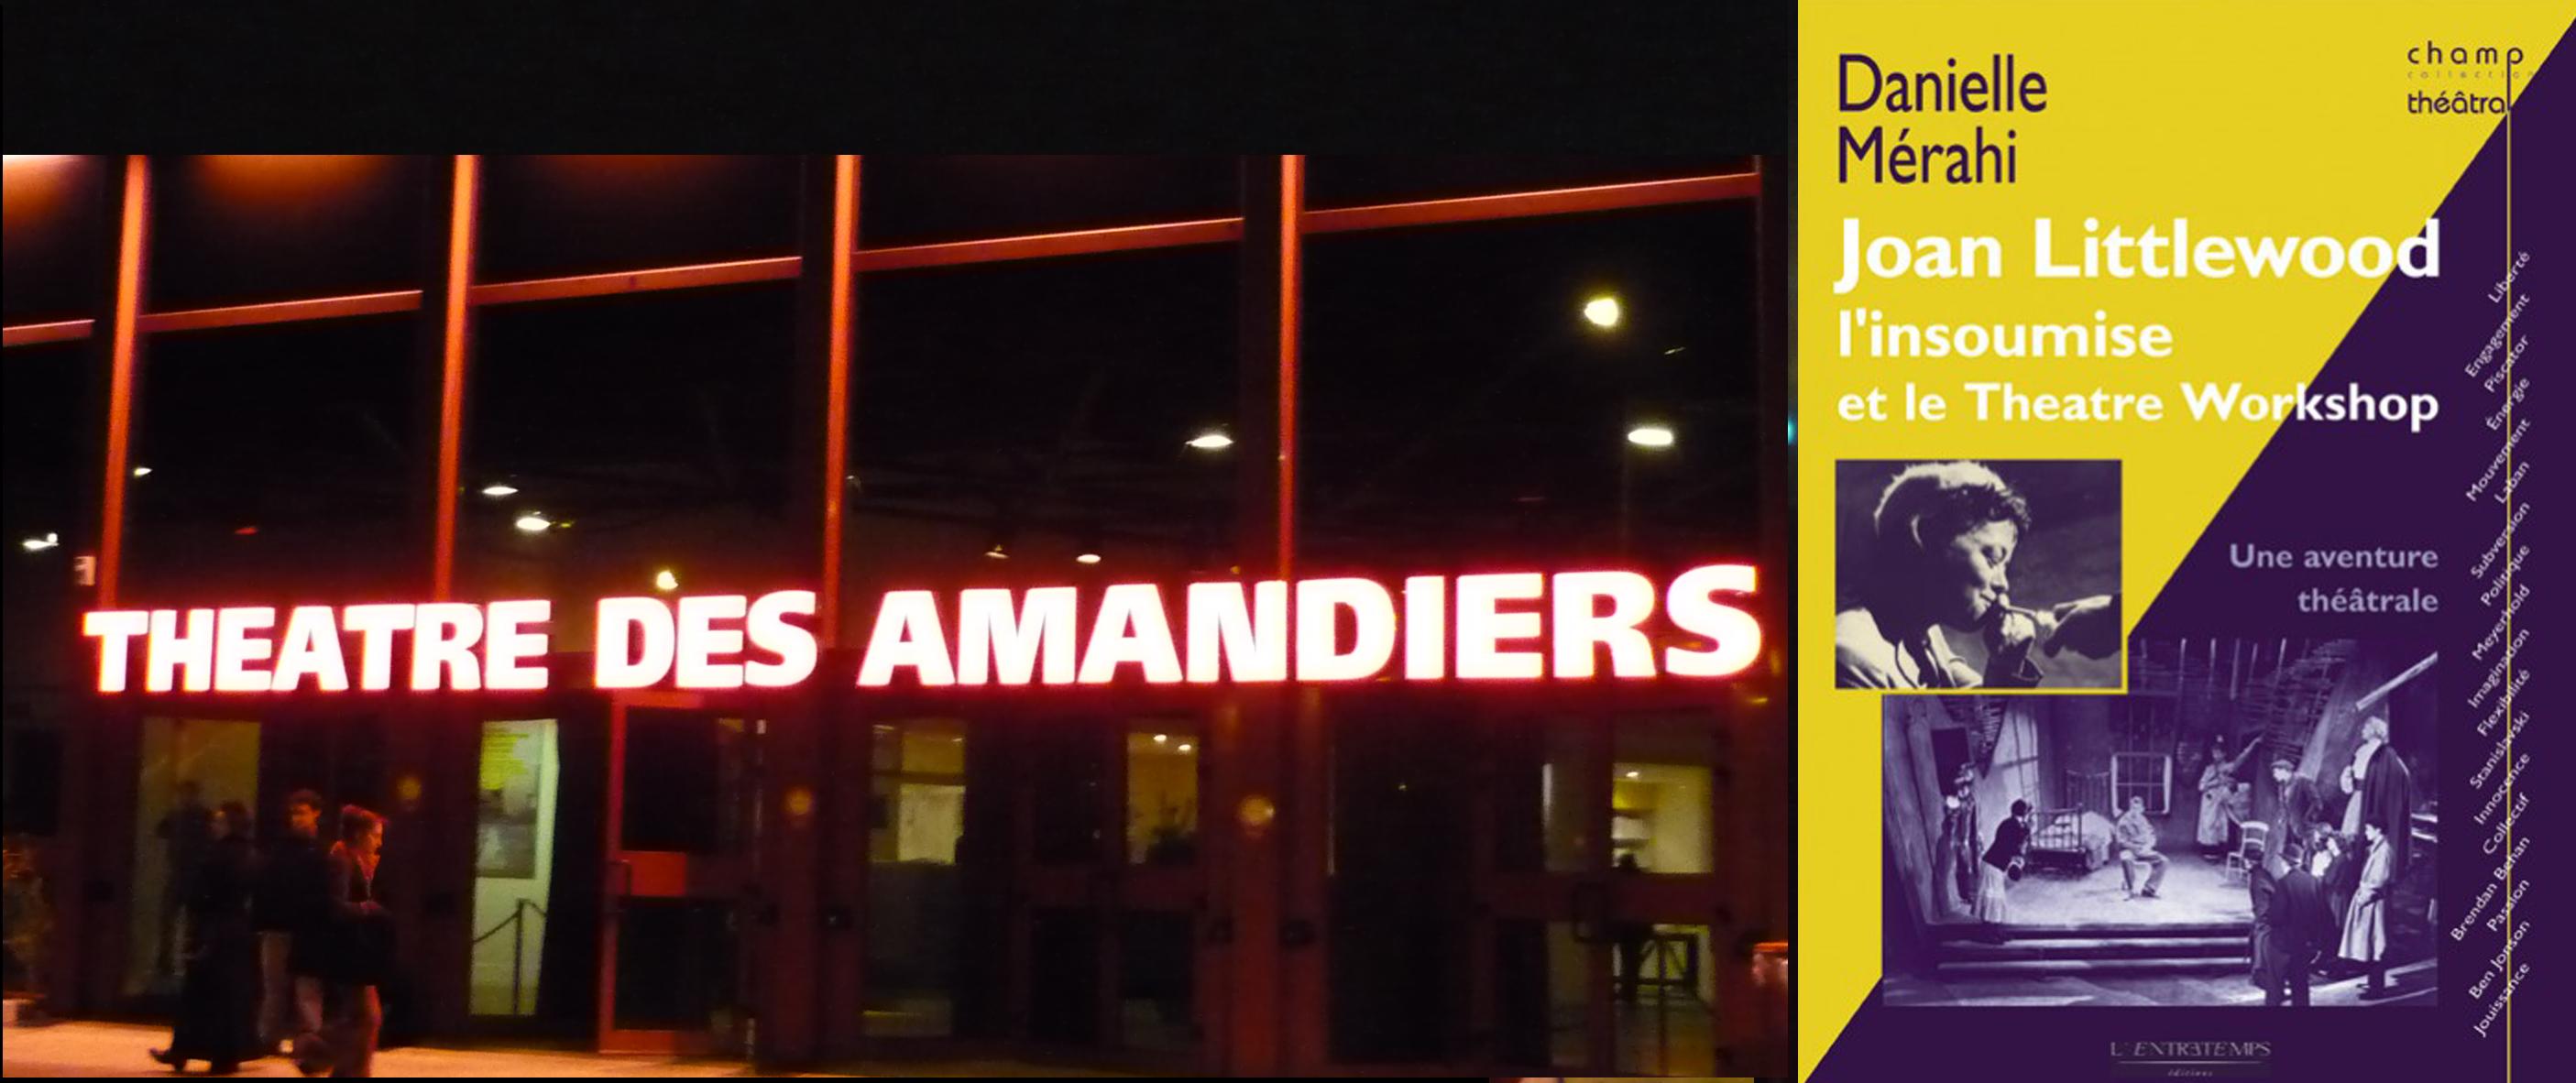 Theatre_Nanterre-Amandiers2-1478019542.jpg